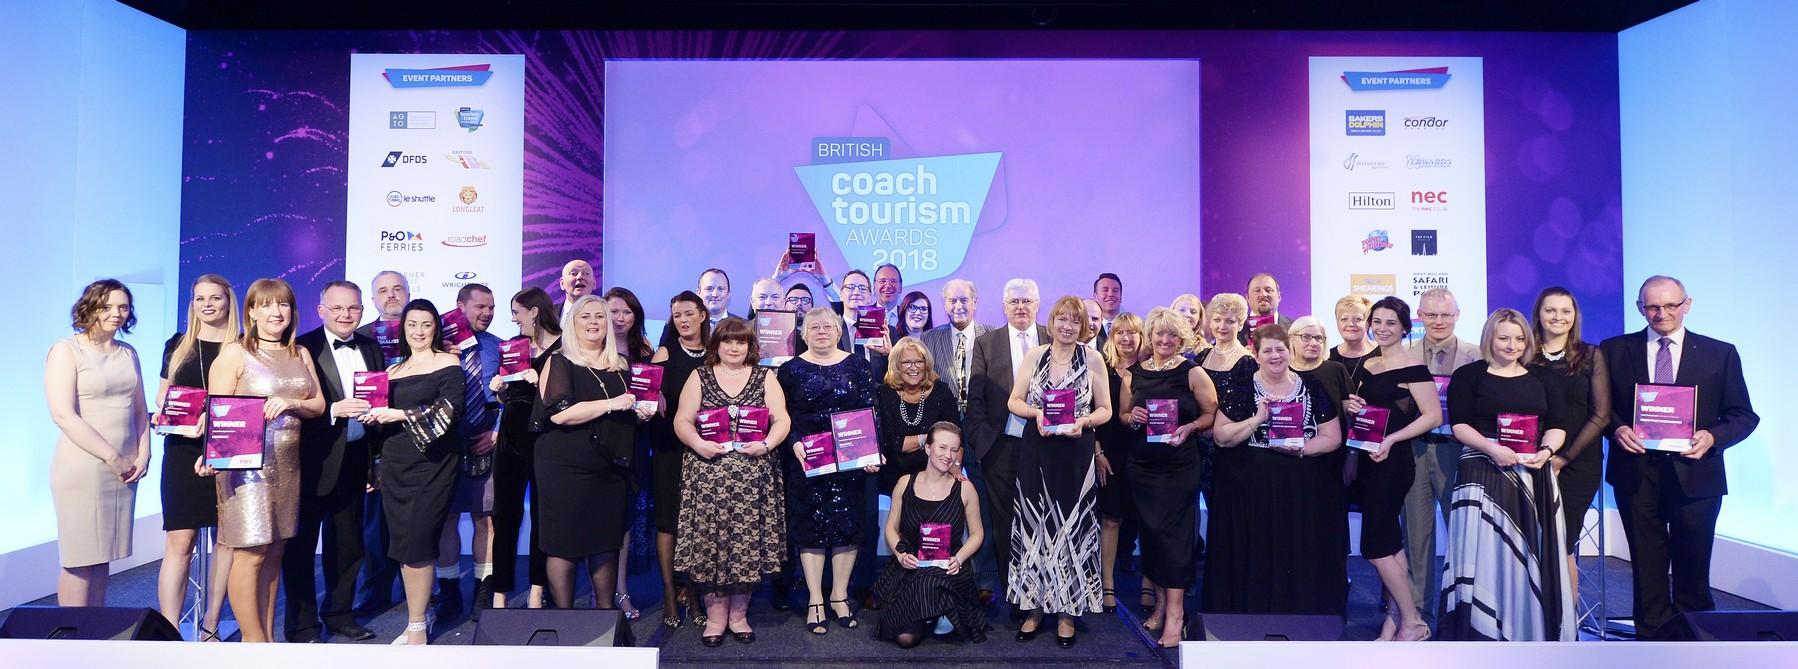 British Coach Tourism Awards 2018